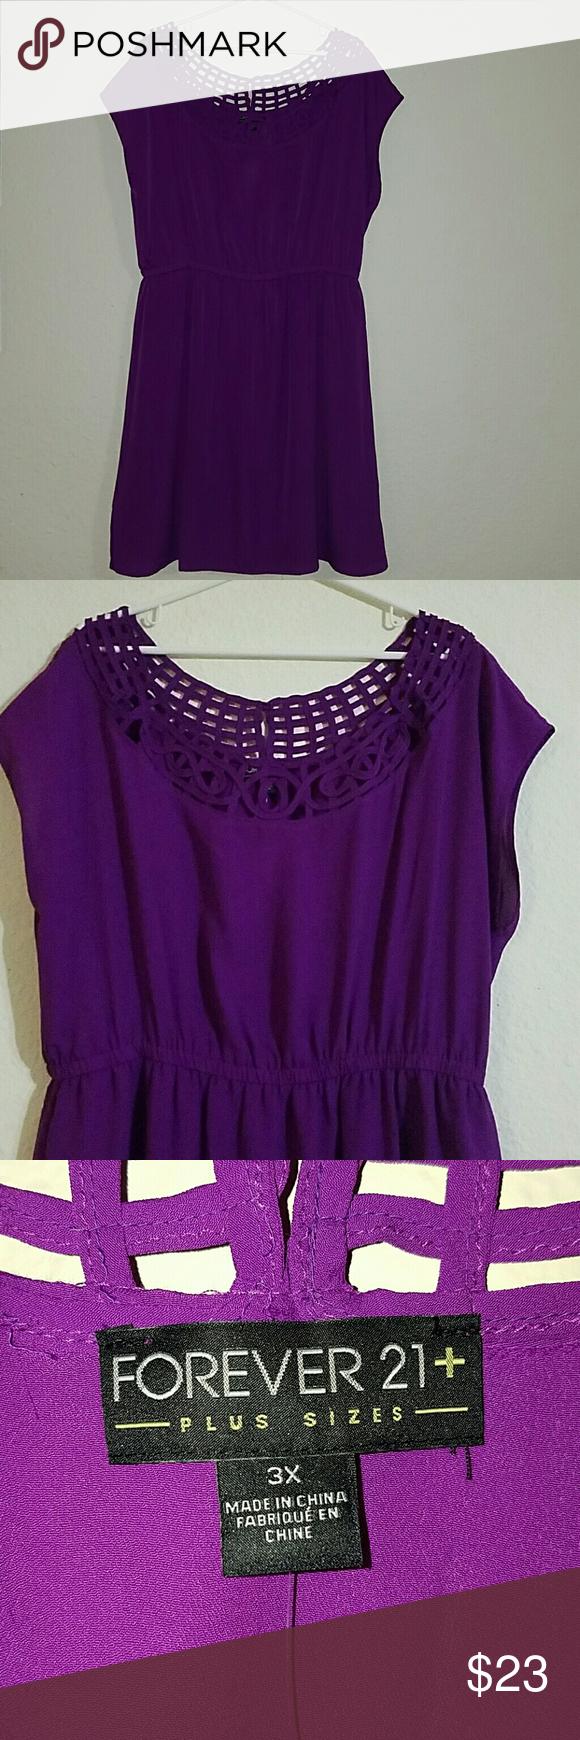 Purple forever21 dress